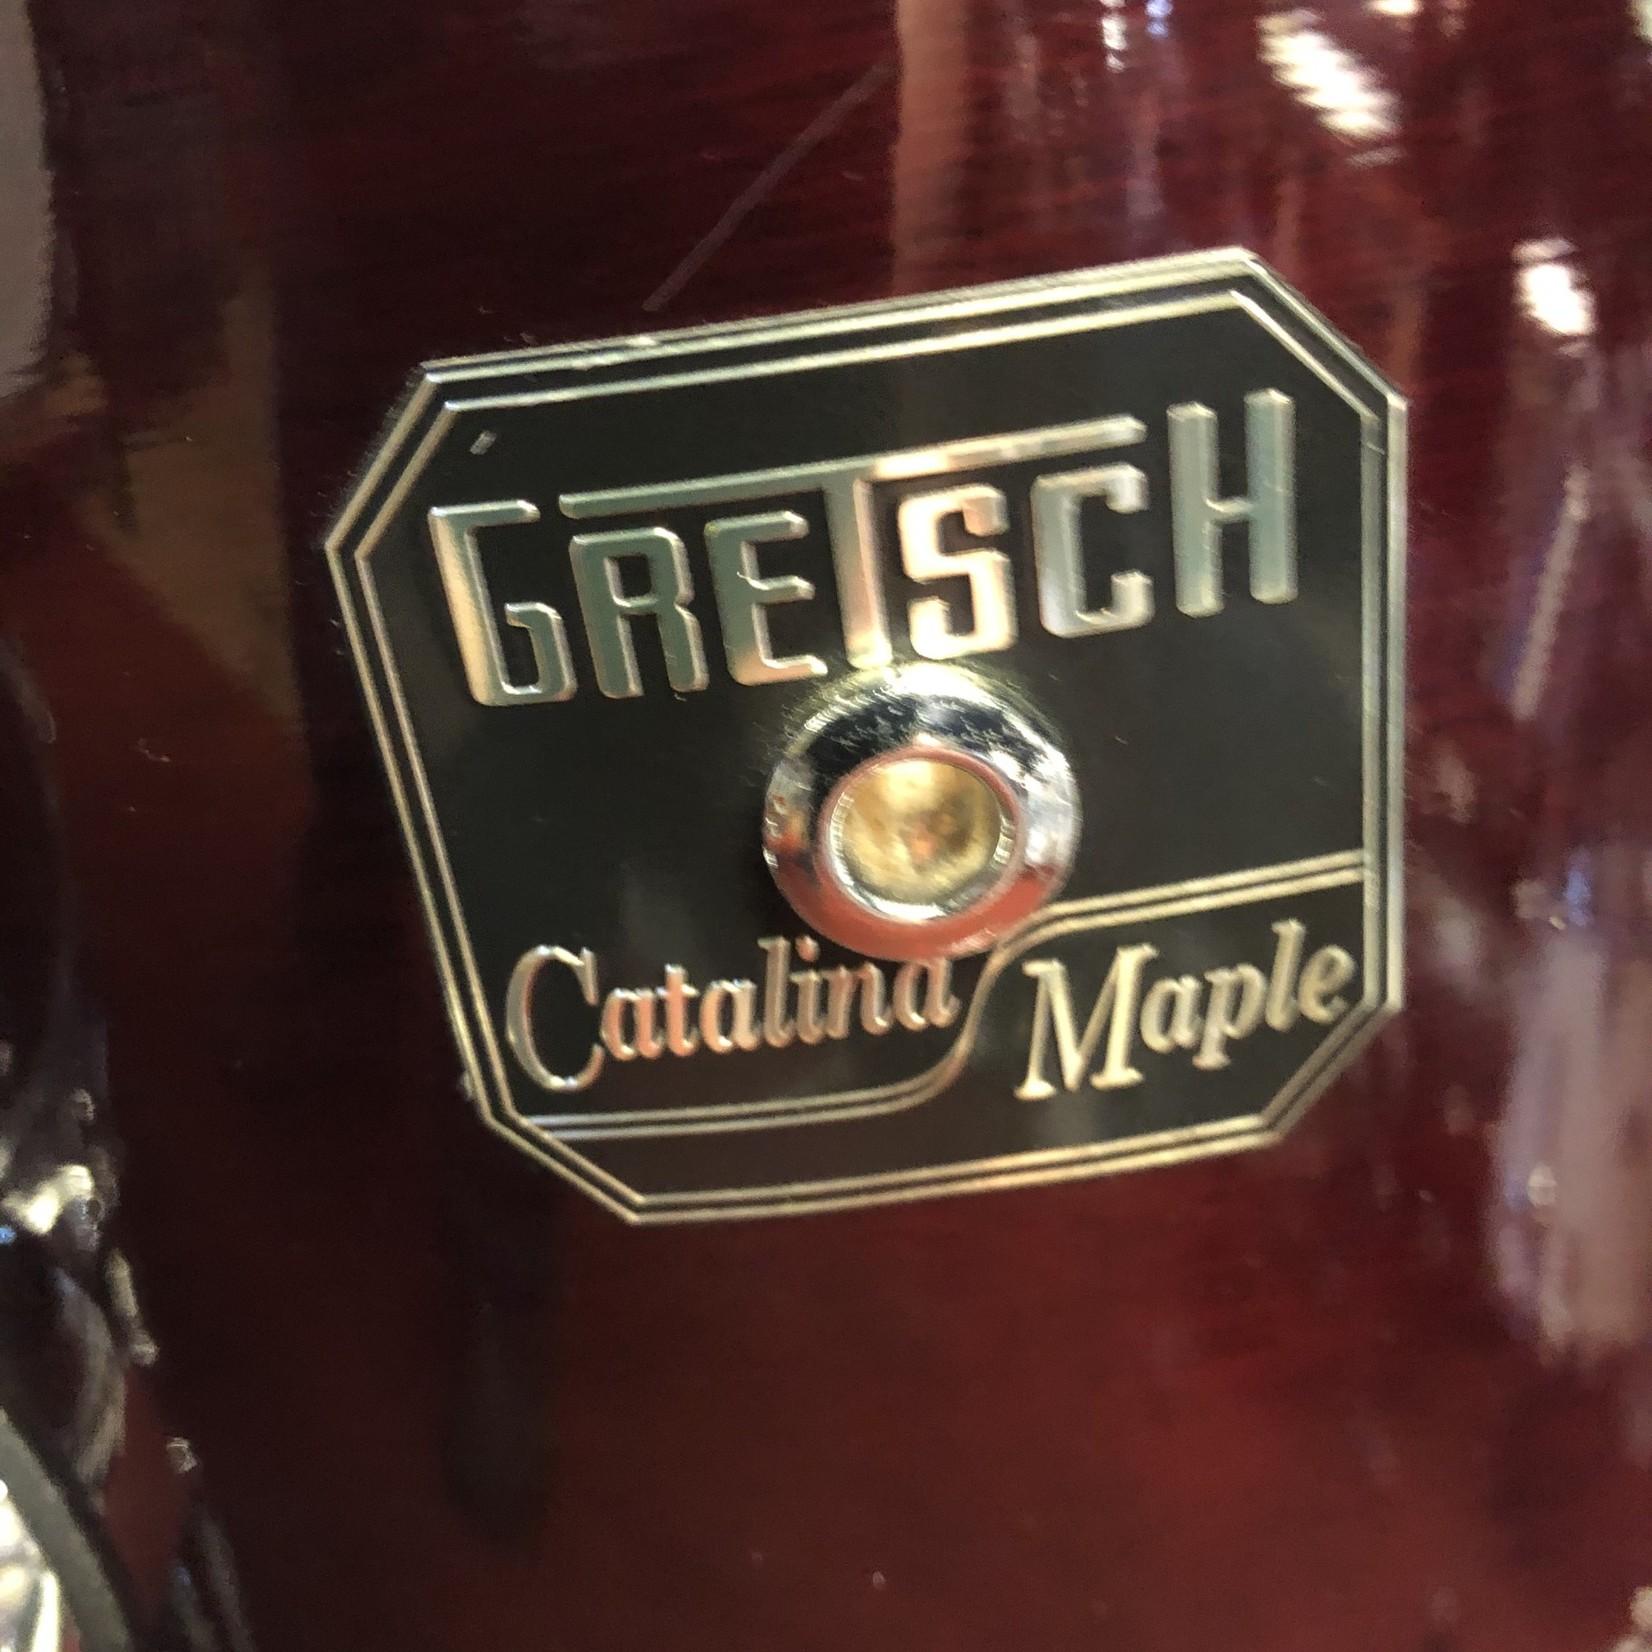 Gretsch GRETSCH CATALINA MAPLE 6-PC SHELL PACK 10/12/14/16/22/14s (CHERRY)